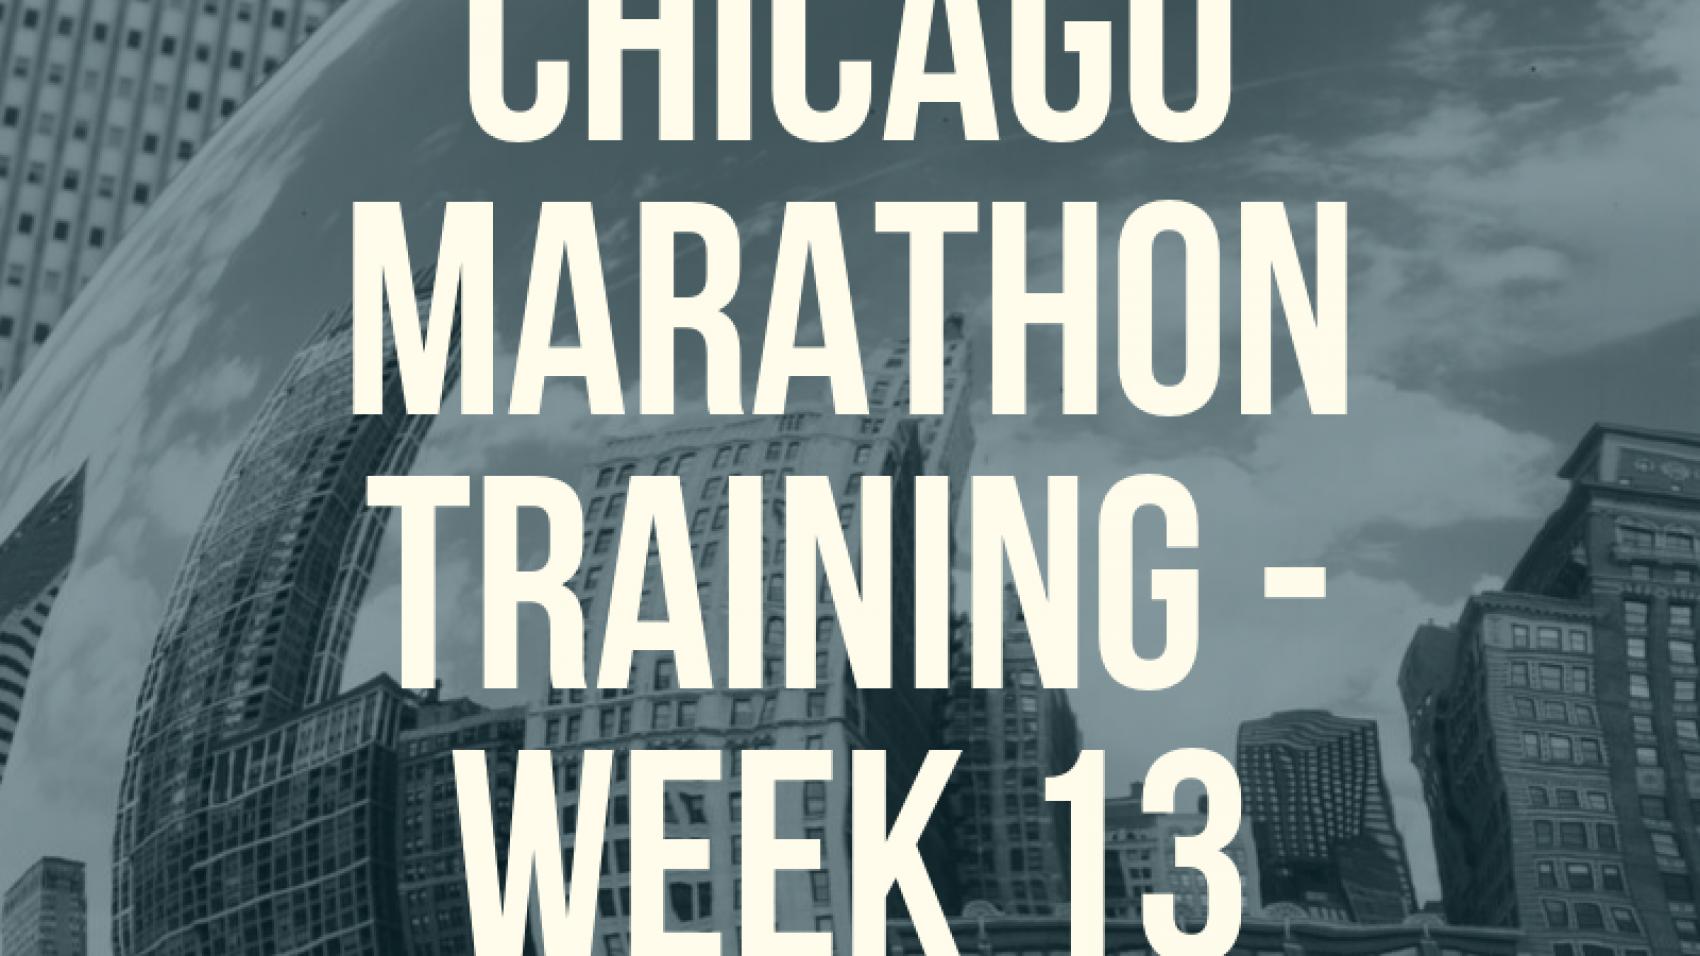 Copy of Copy of Chi Marathon Week 11-3